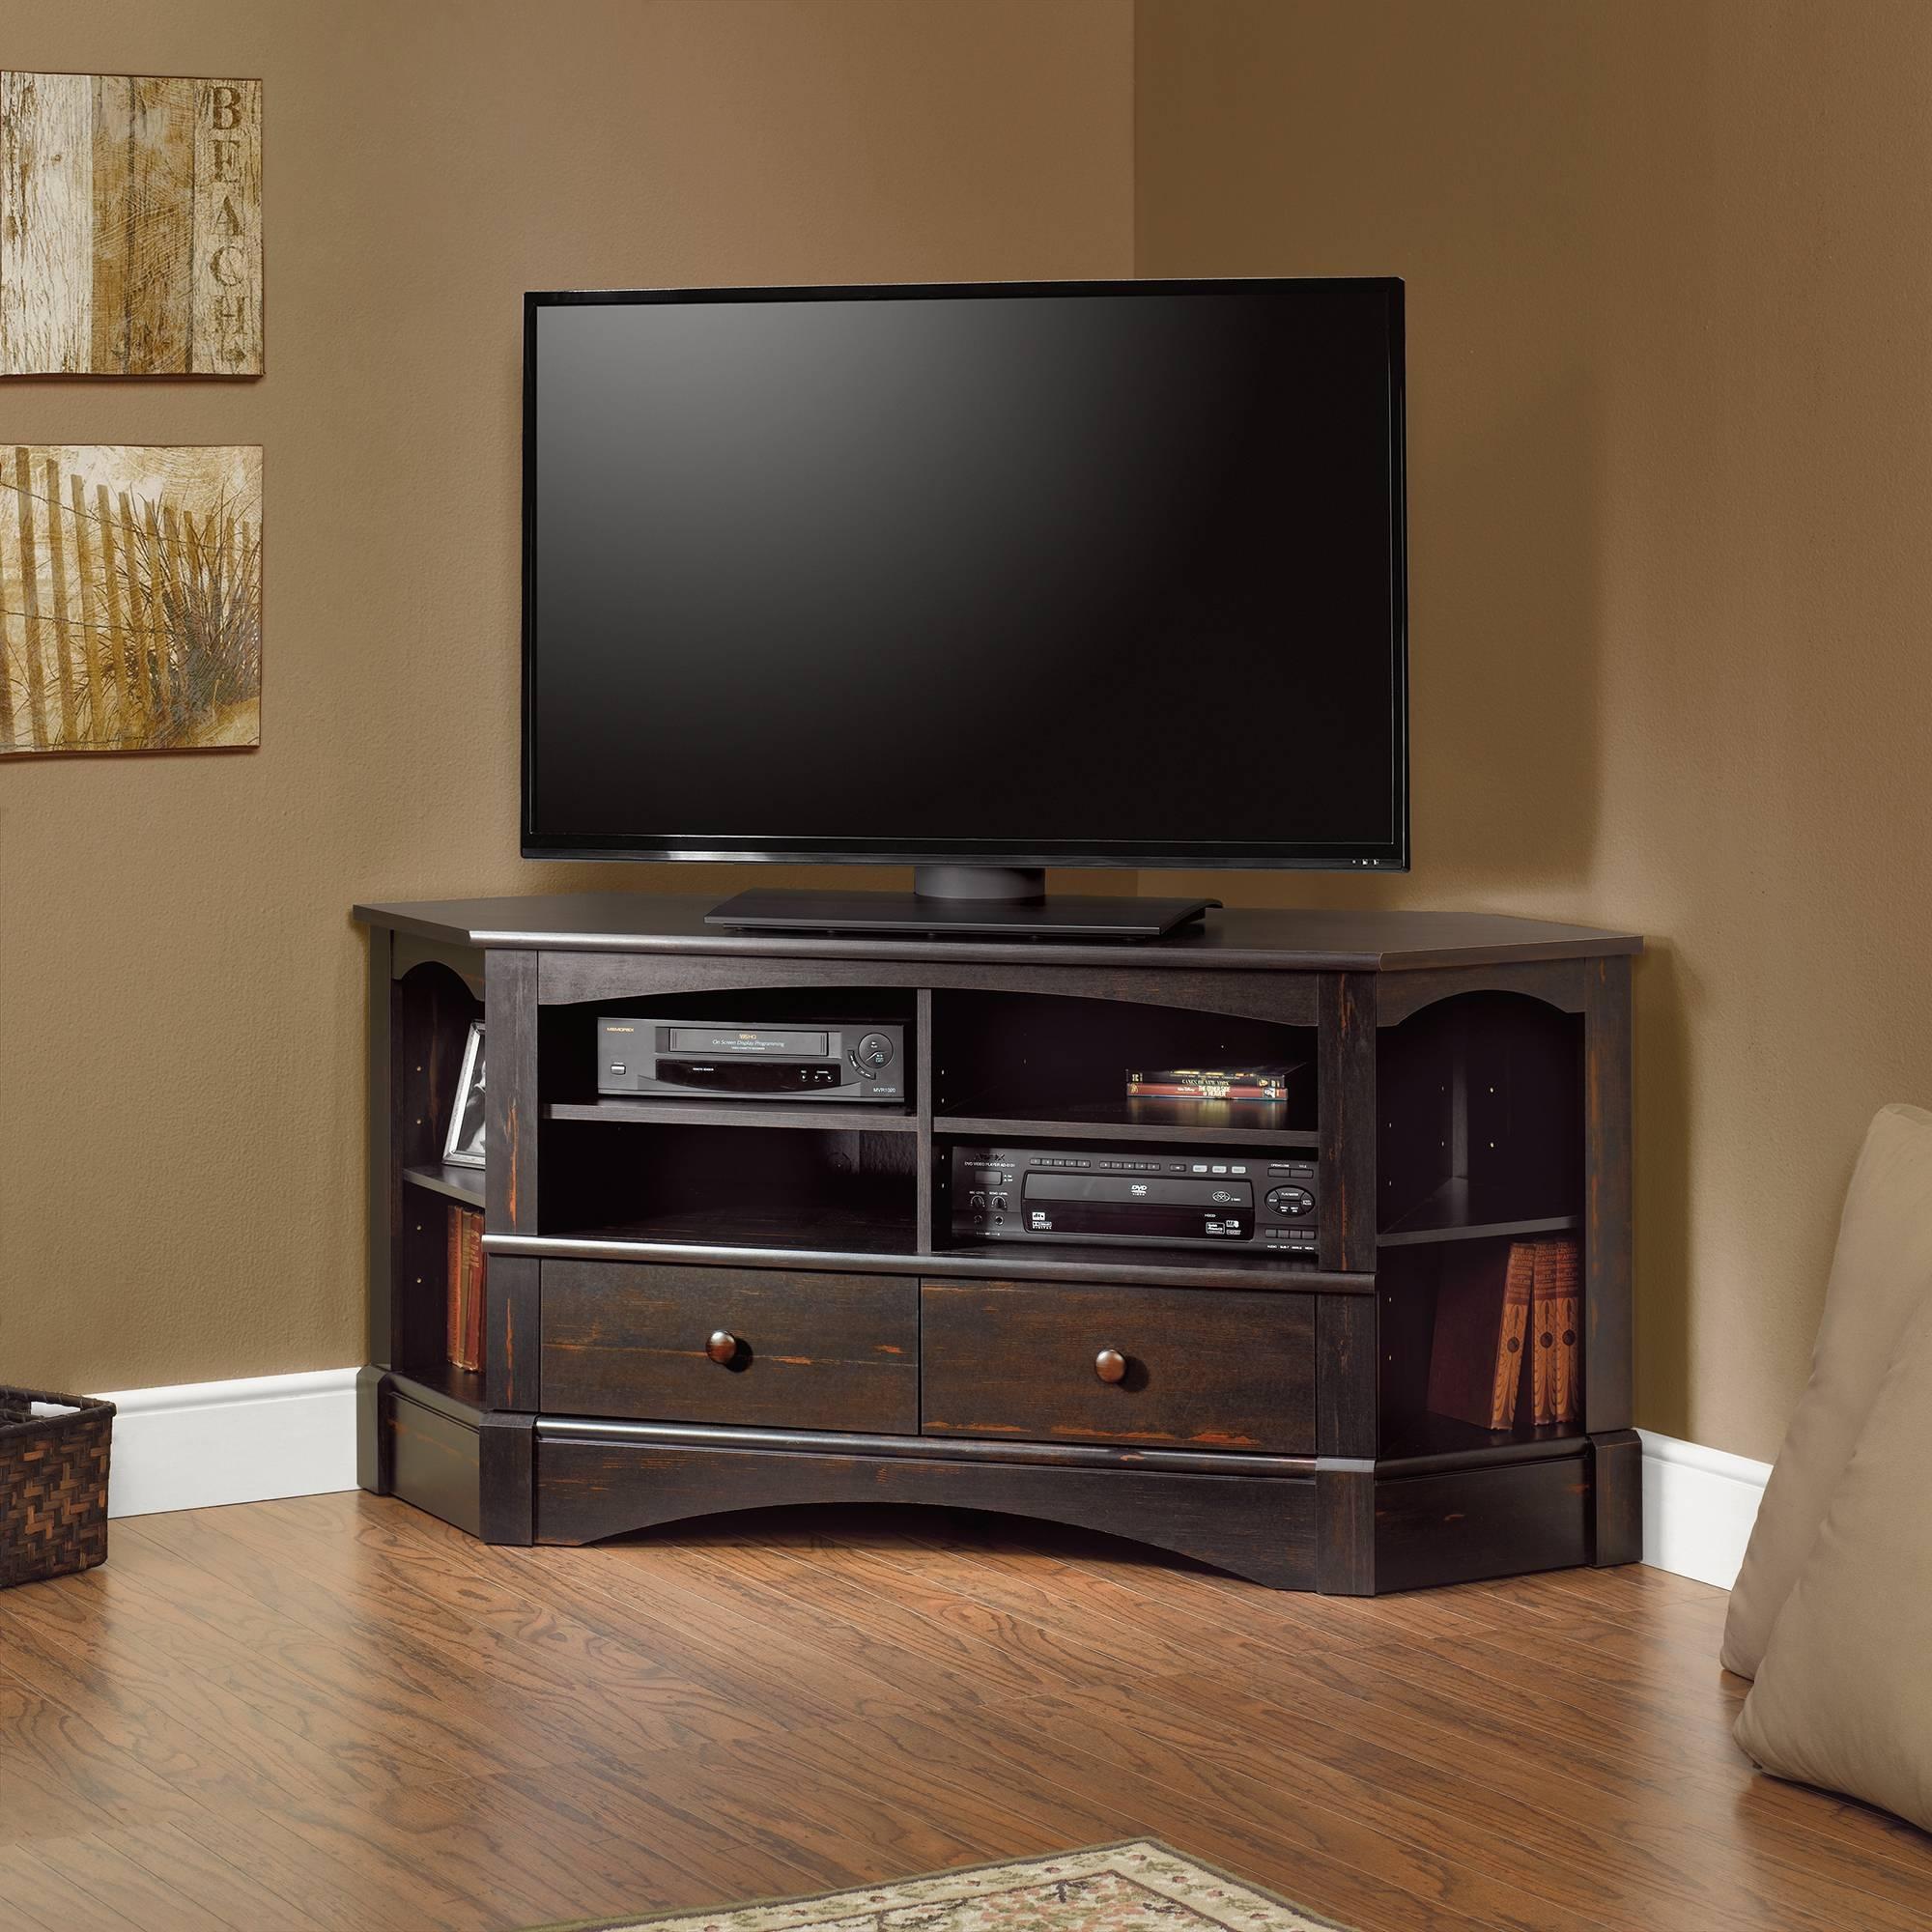 Harbor View | Corner Entertainment Credenza | 402902 | Sauder regarding Black Wood Corner Tv Stands (Image 7 of 15)